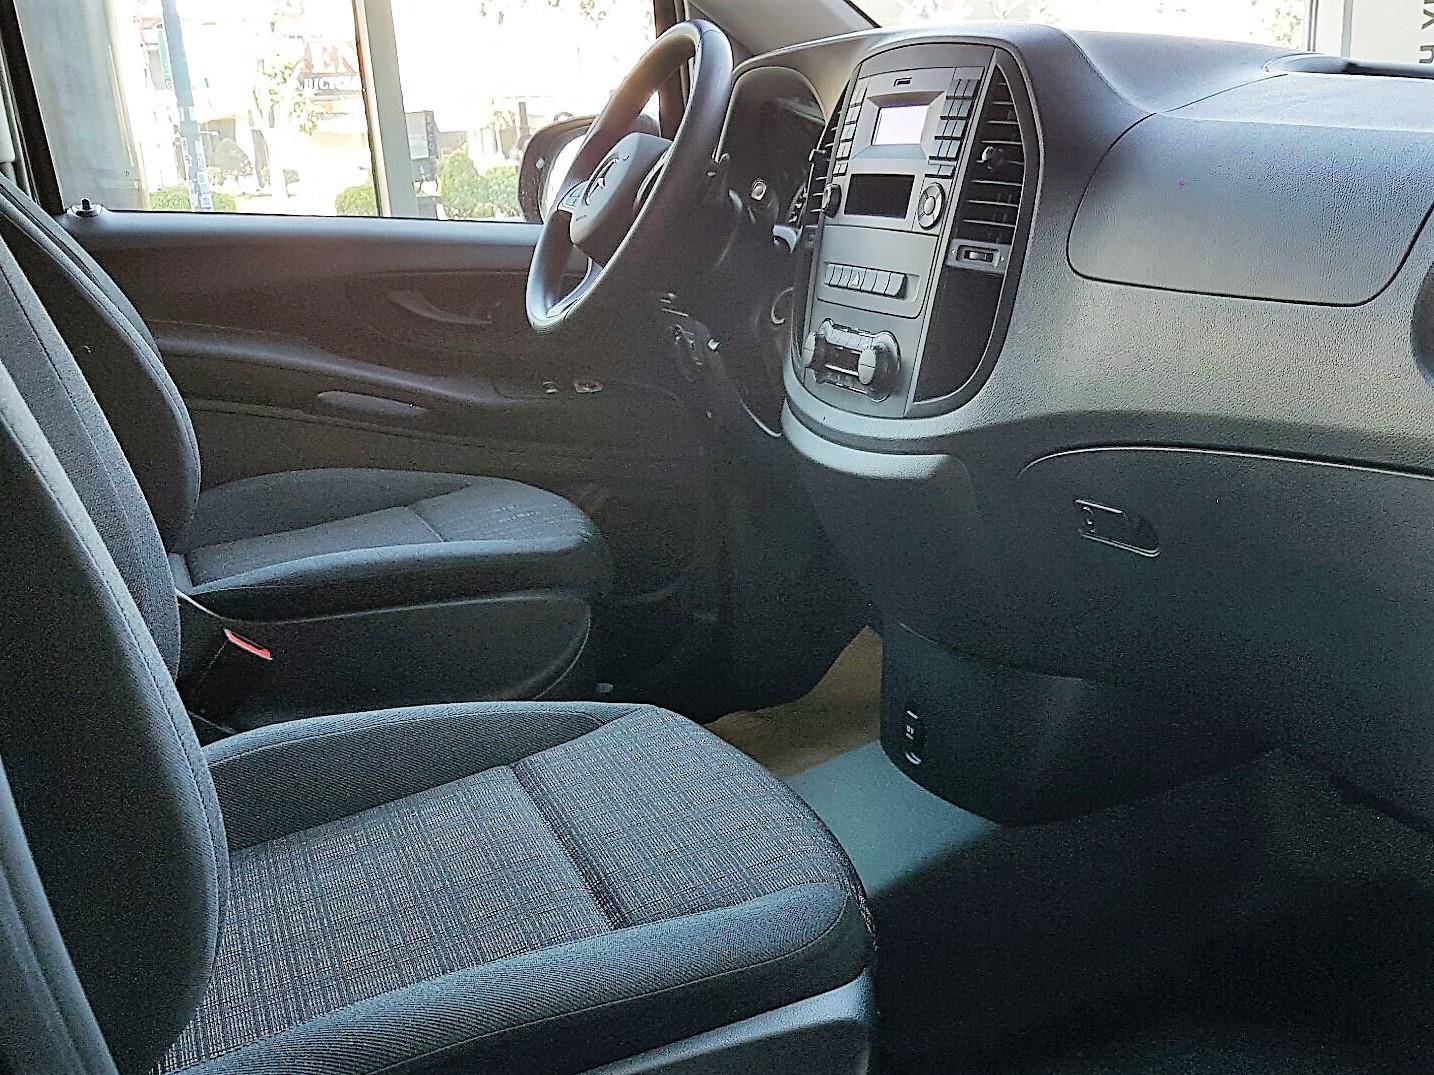 Nội thất Xe Mercedes Benz Vito Tourer 121 8 Chỗ Máy Xăng 03